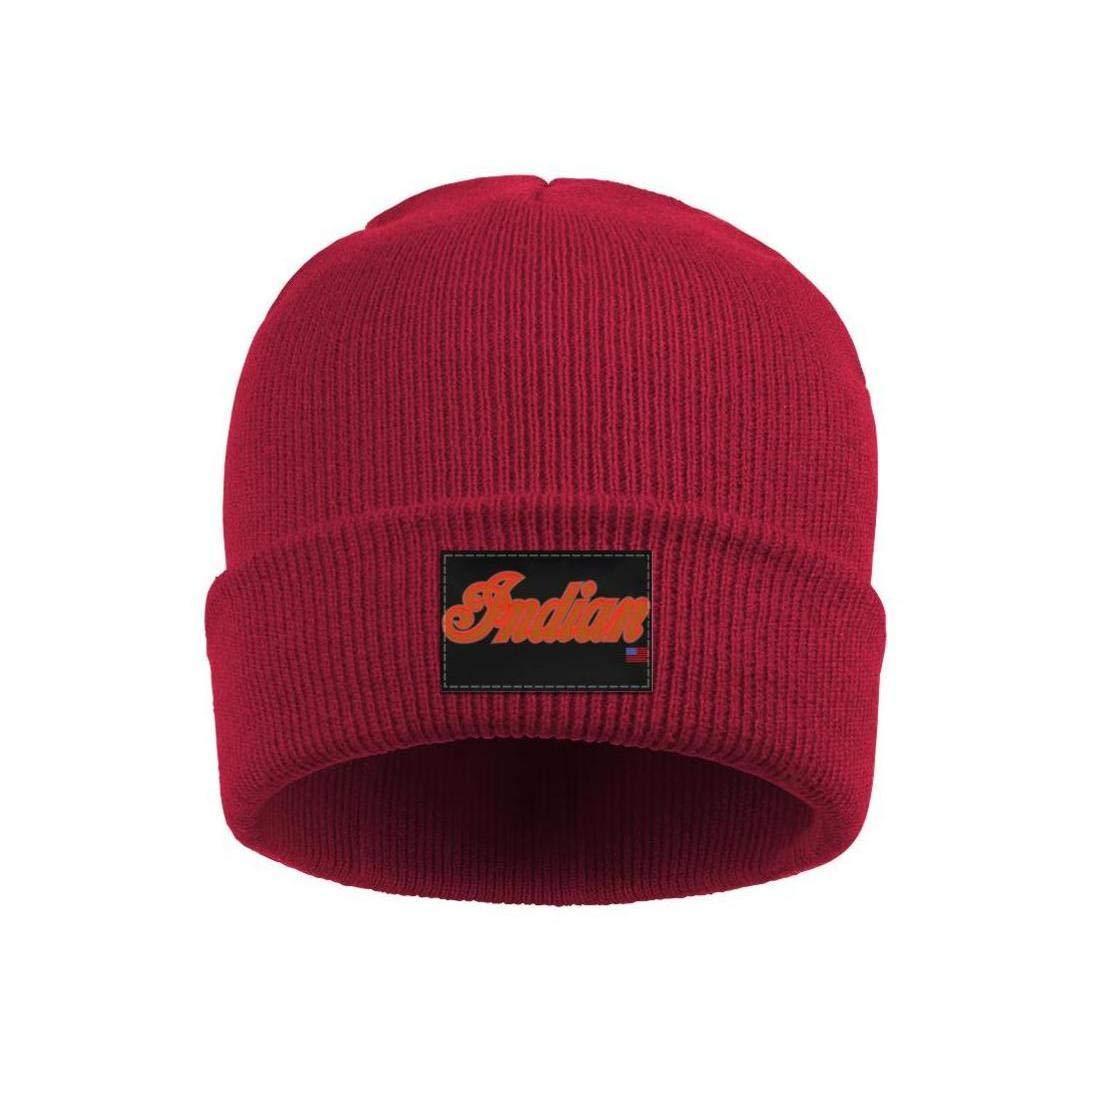 Wool Beanie Cap Knit Caps Fine Knit Beanie HatsWinter Outdoor Sport Ski sdfjkoinj Mens Indian-Motorcycles-logp